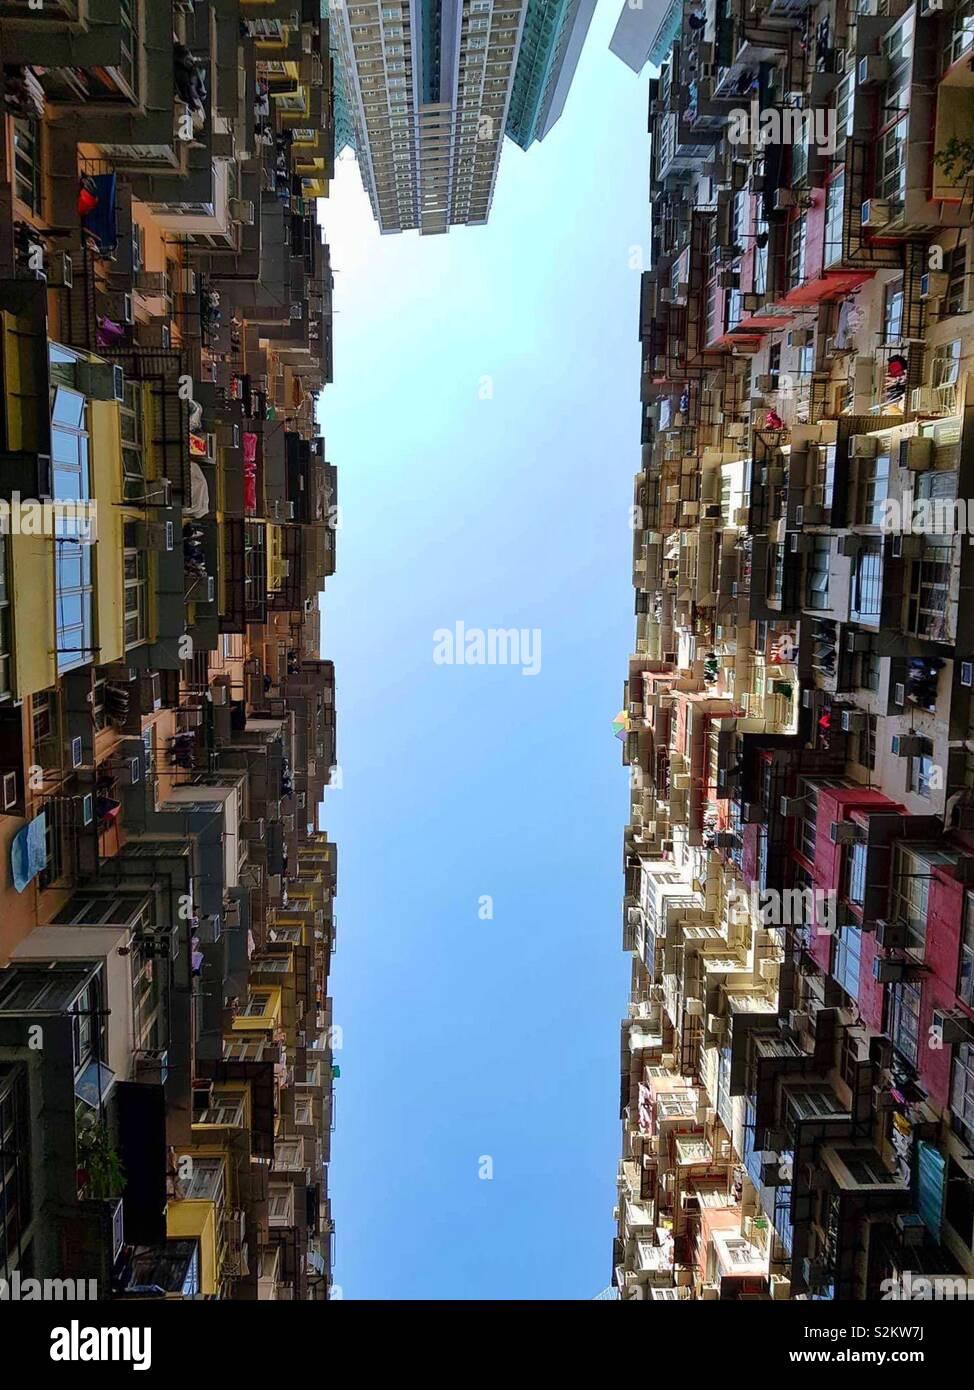 Hong Kong, Mansion Türme, Suchen, hohes Gebäude. Stockfoto